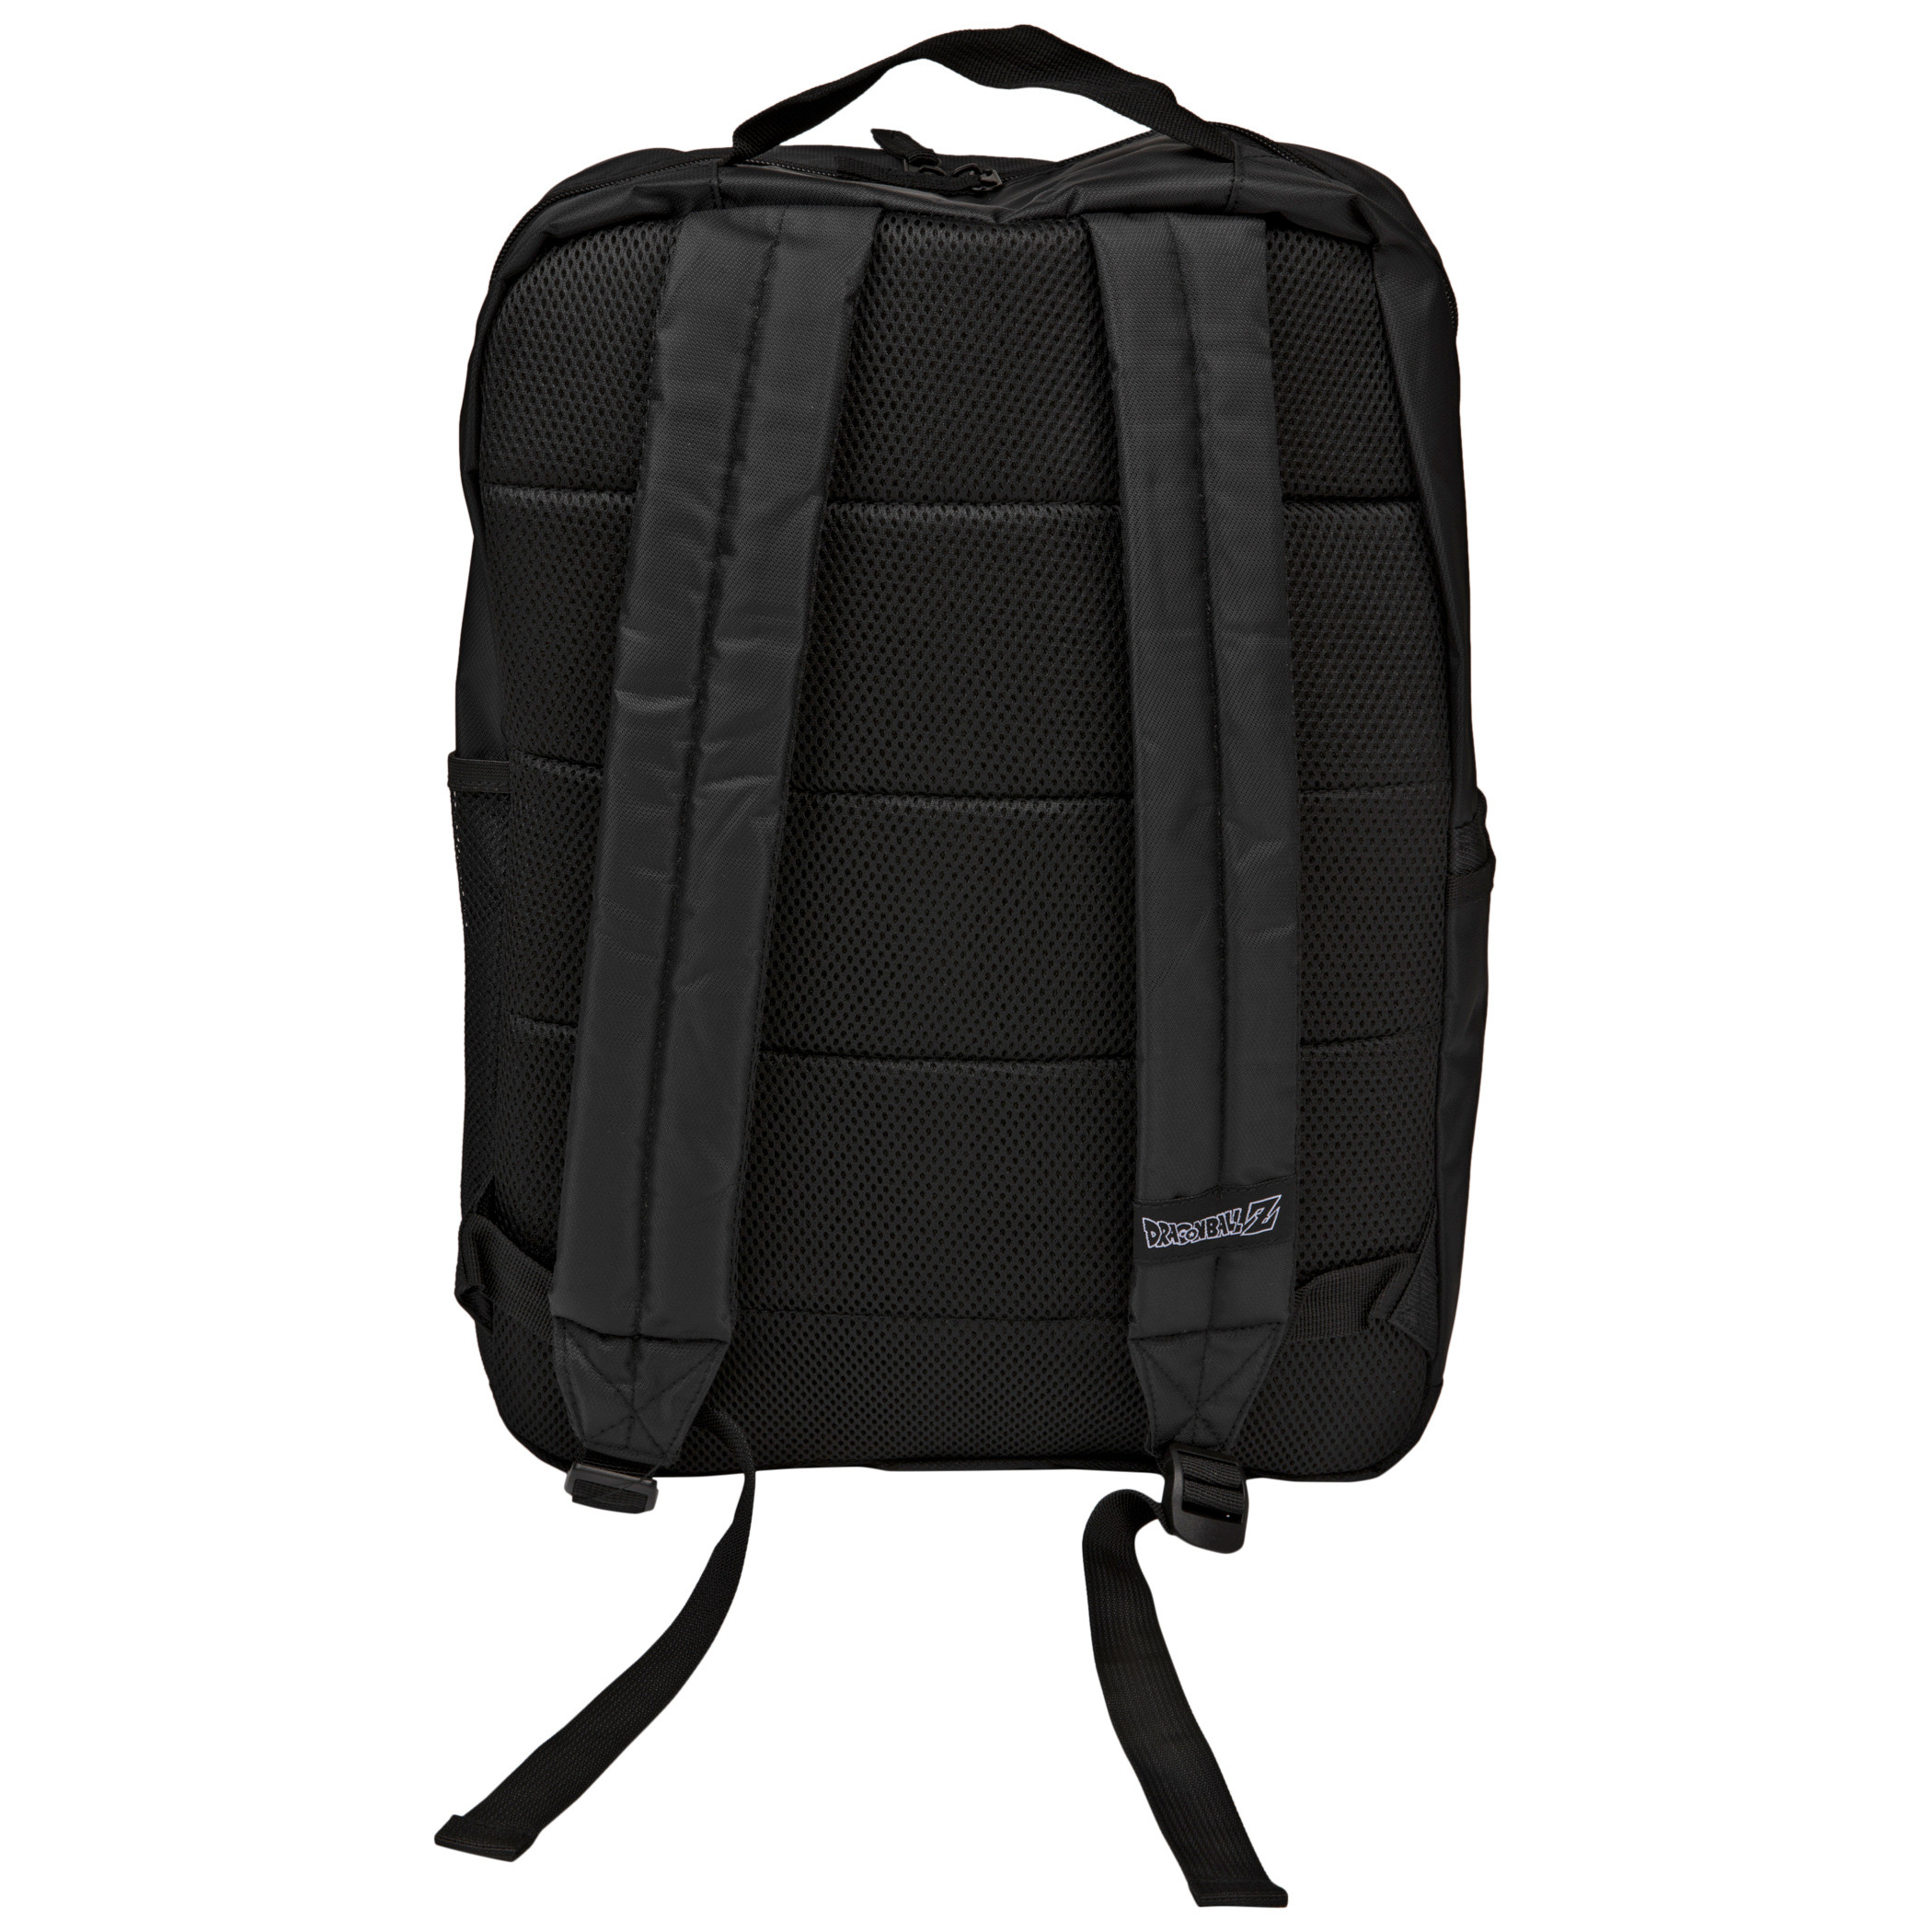 Dragon Ball Z Strap Backpack